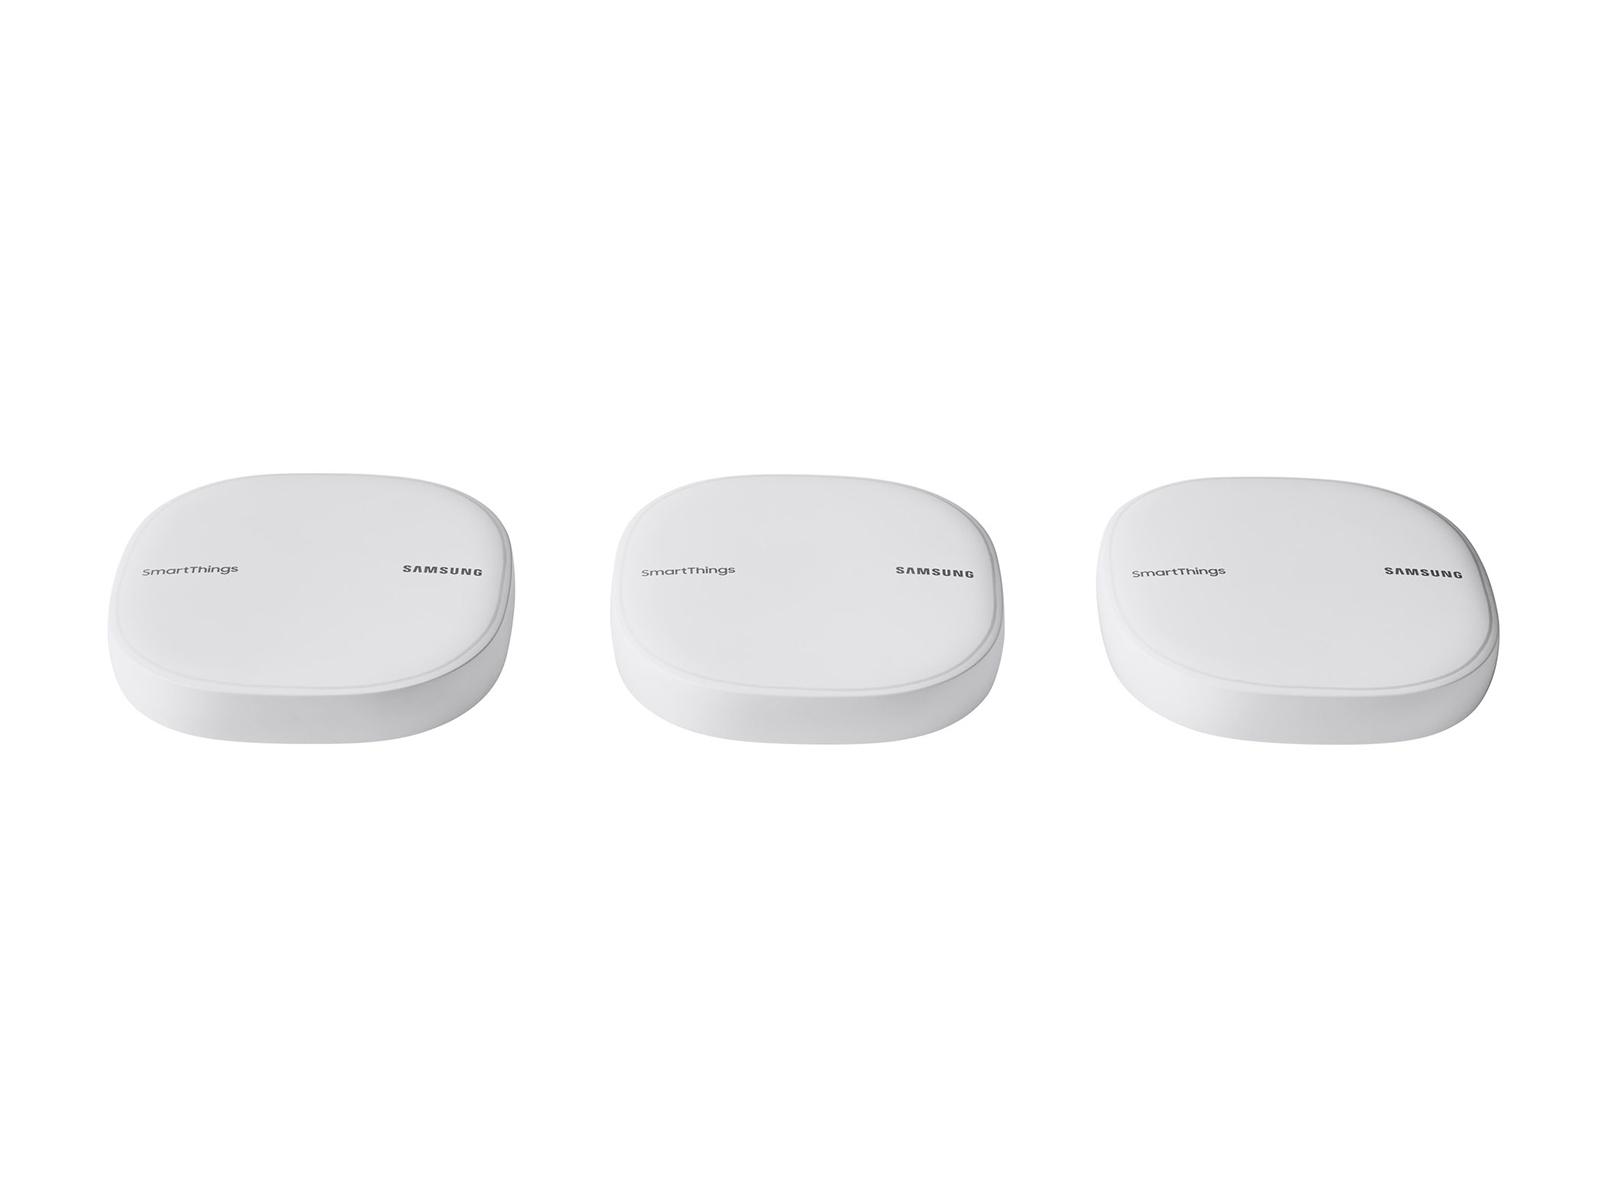 Samsung SmartThings Wifi 3-pack